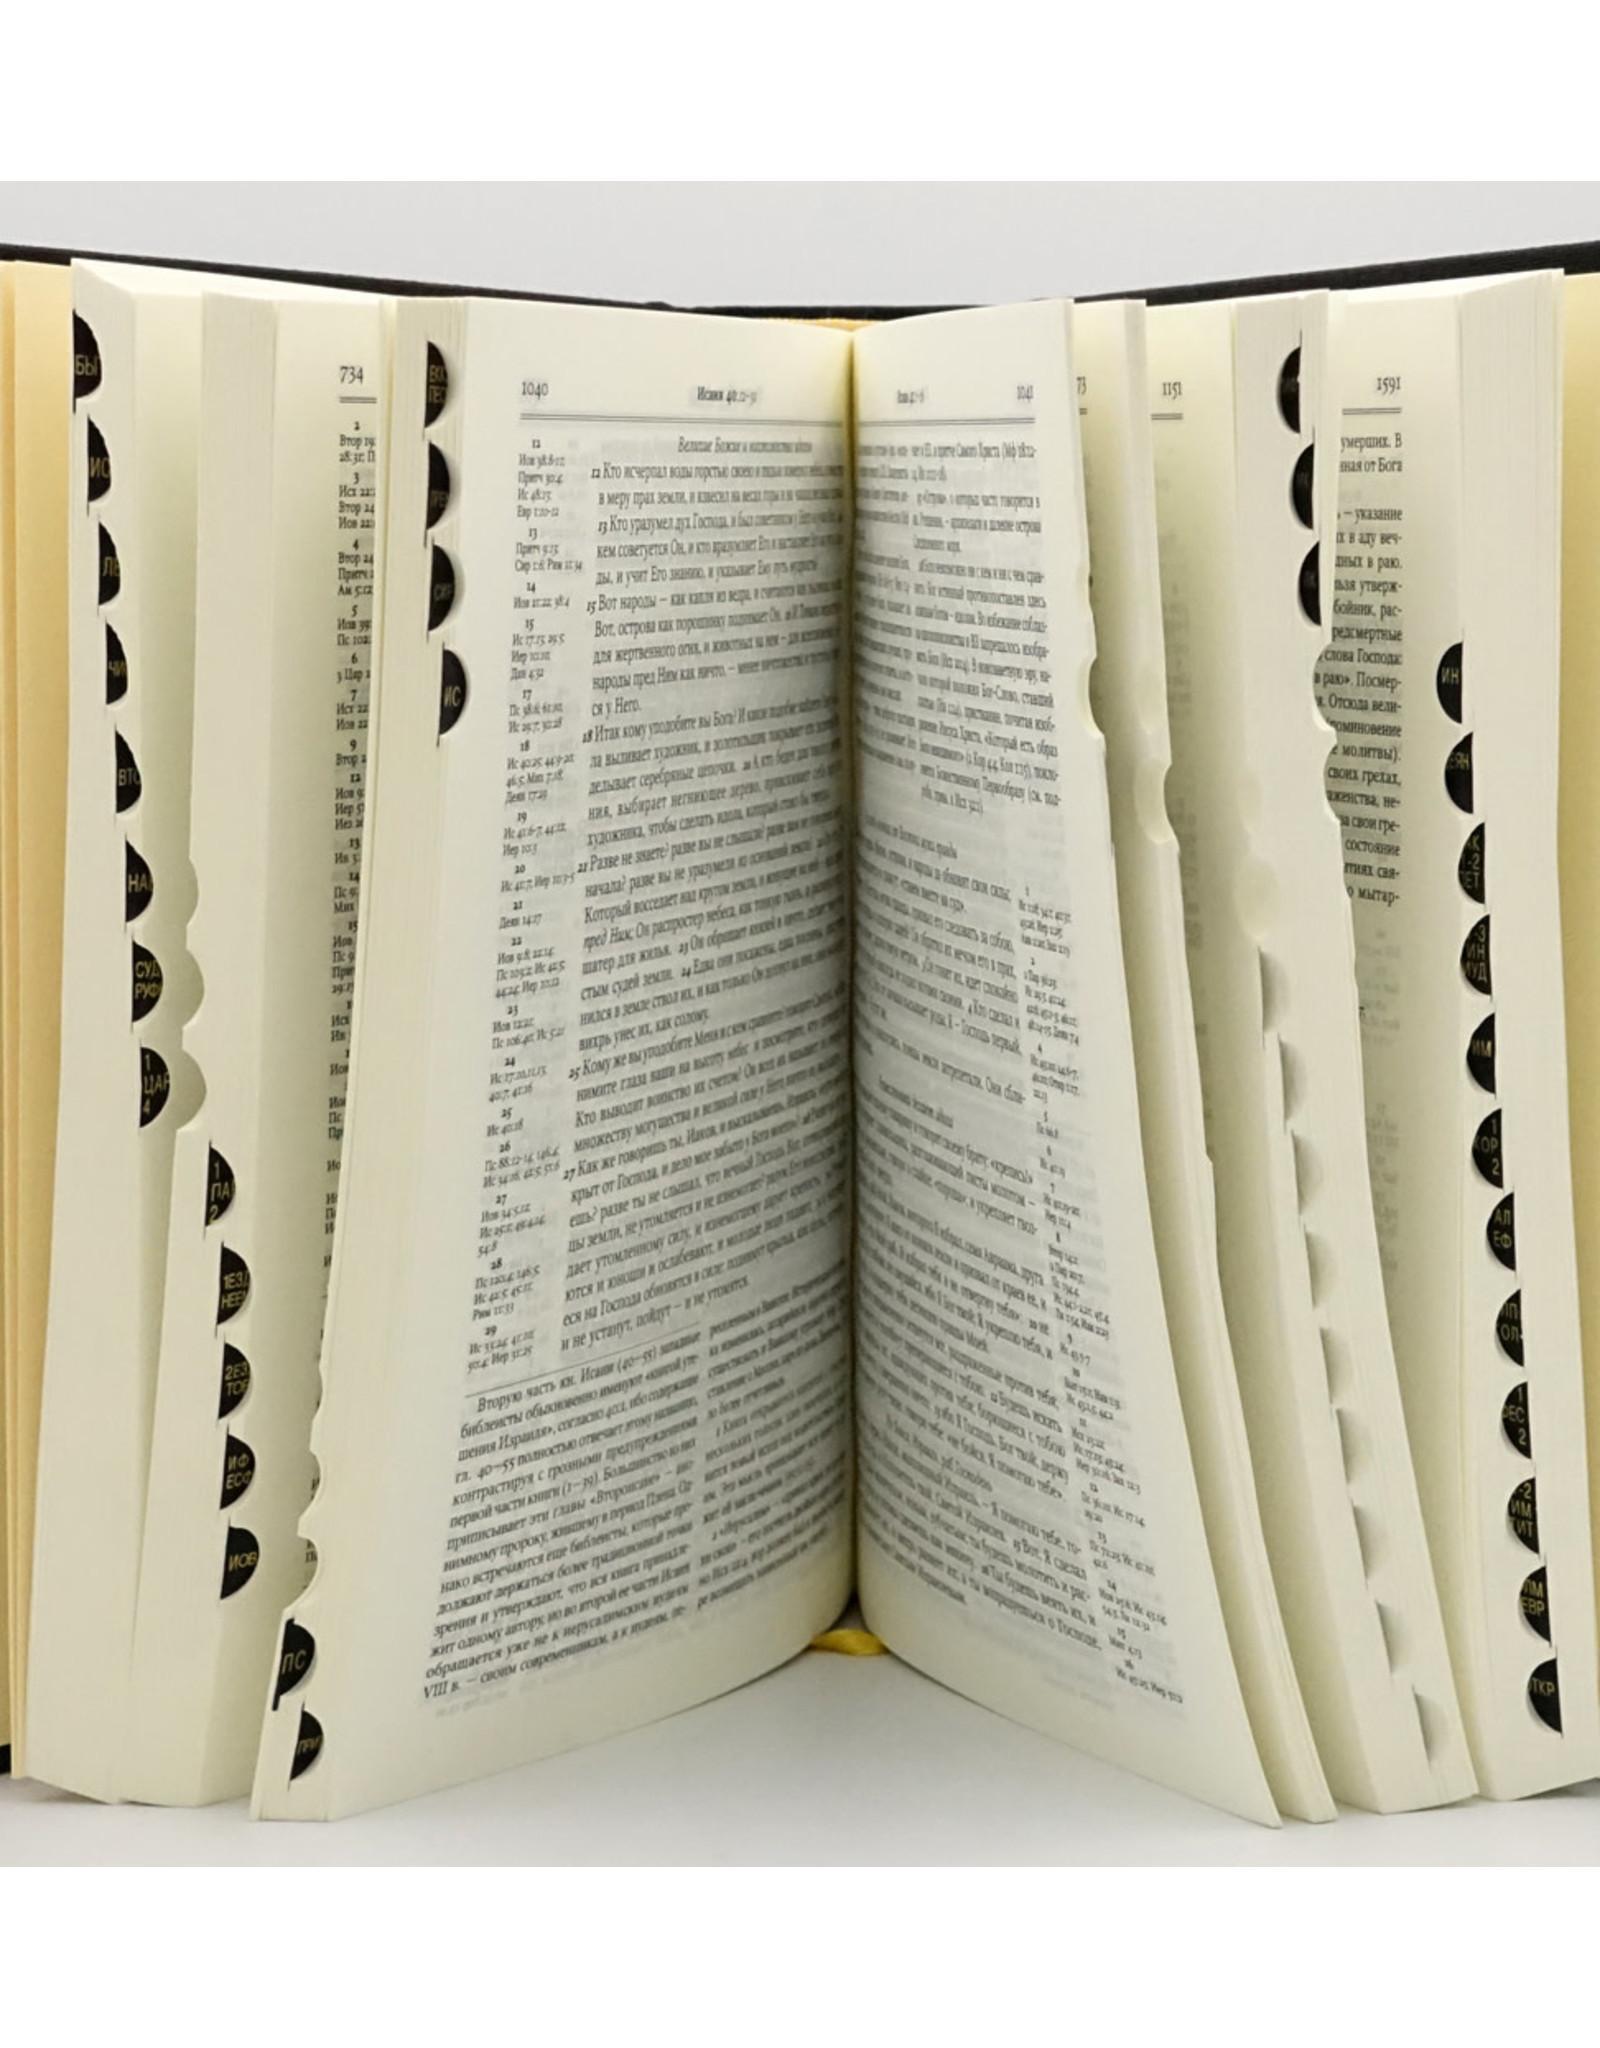 Библия с Комментариями (SYNO), Index, Small,